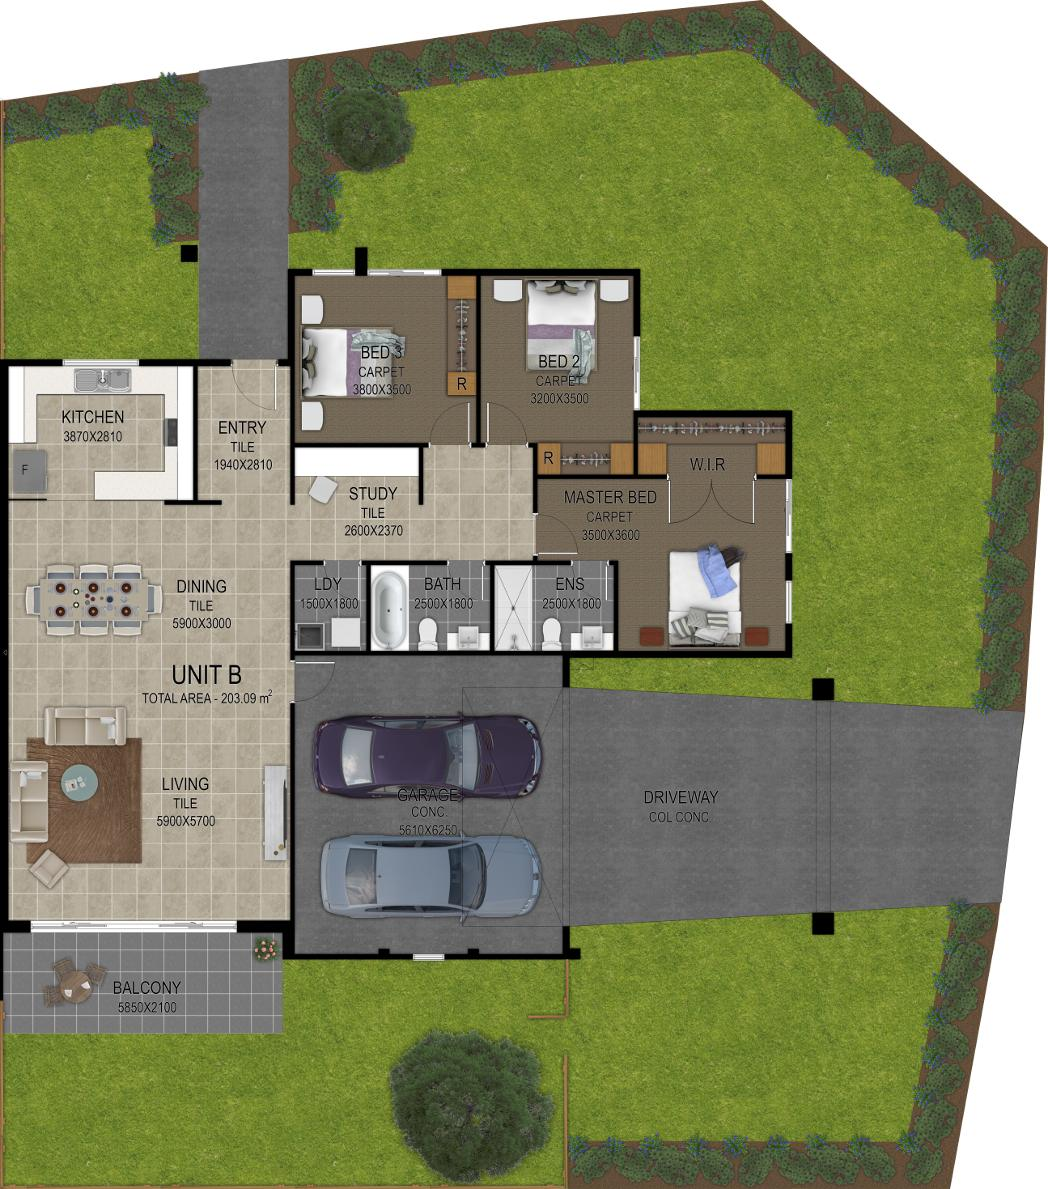 Harrington Park Homes For Sale NSW